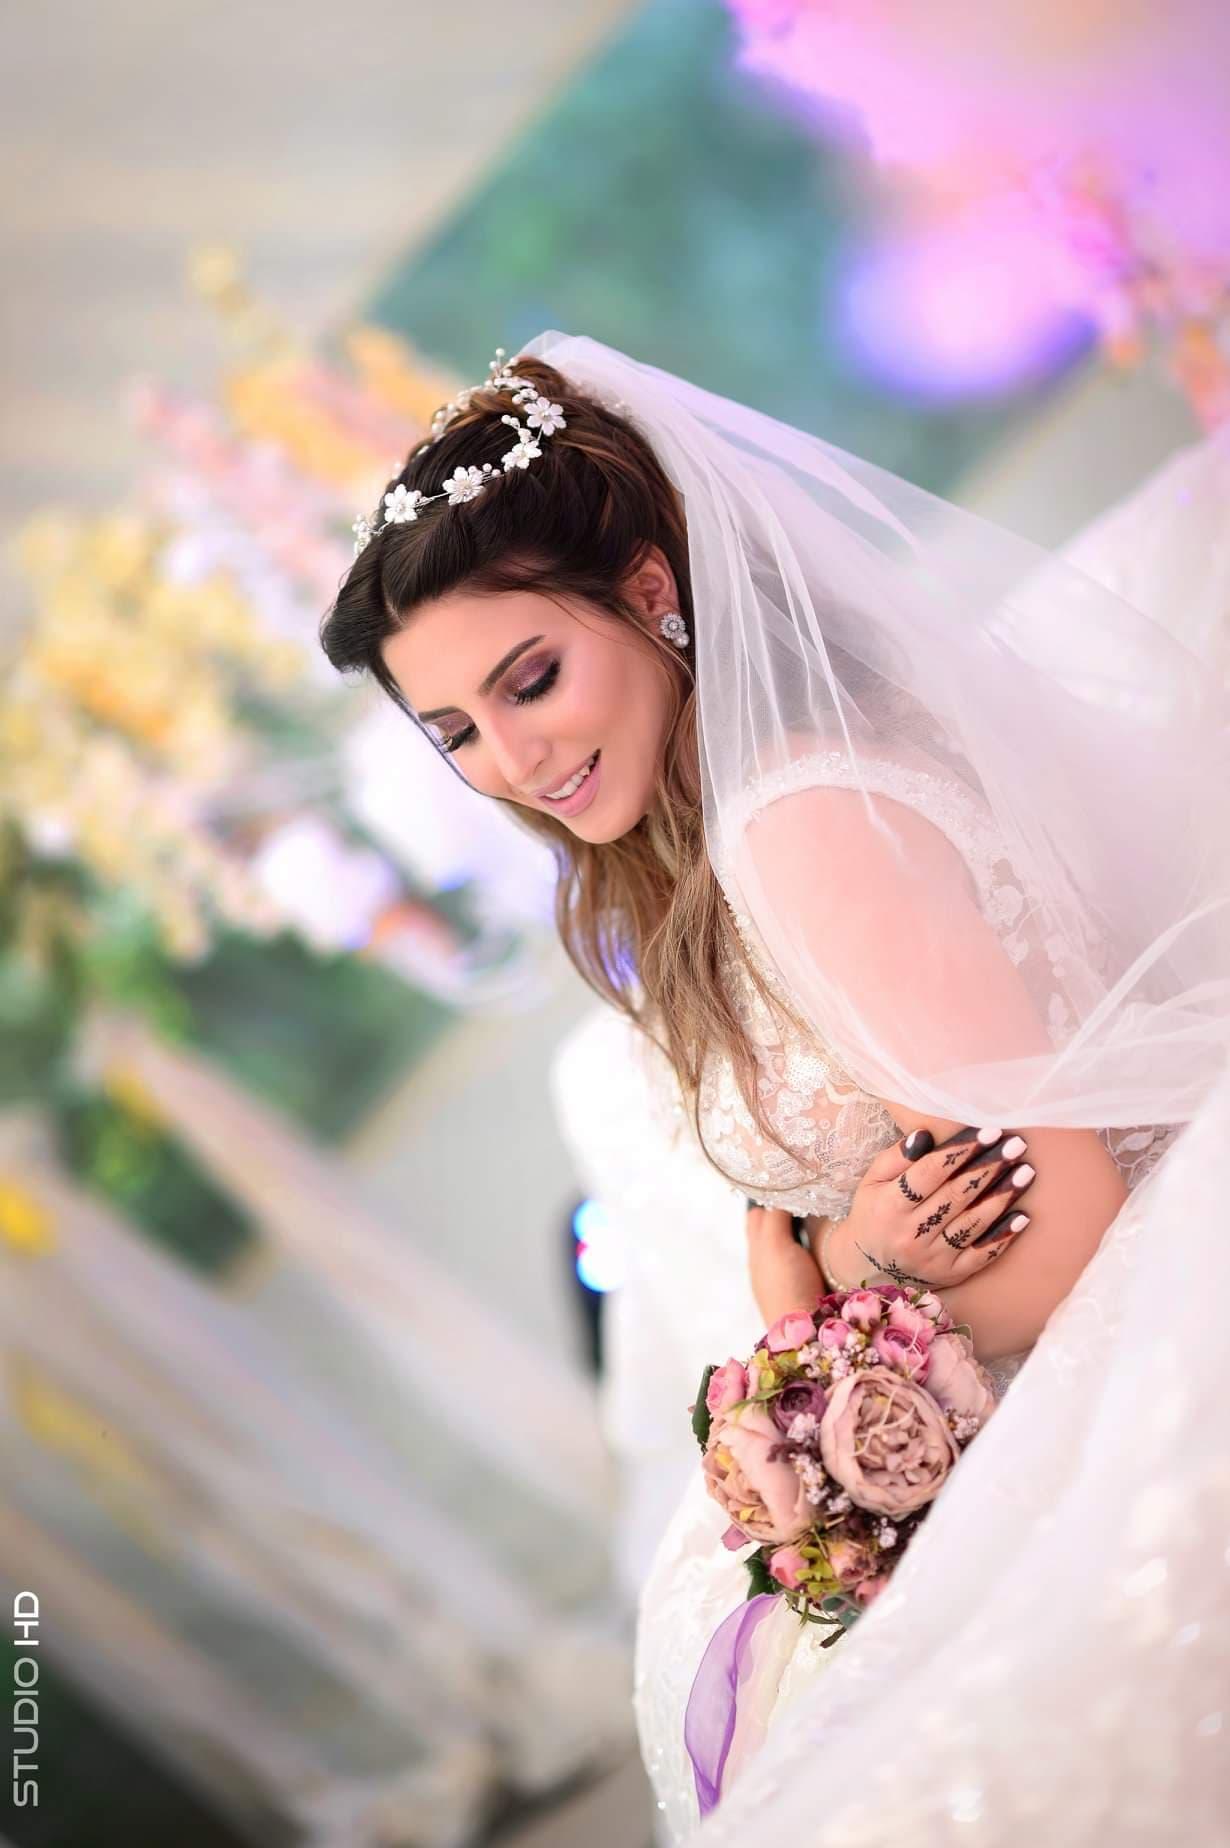 asma8_plus_belles_mariées_tunisiennes_159_2019